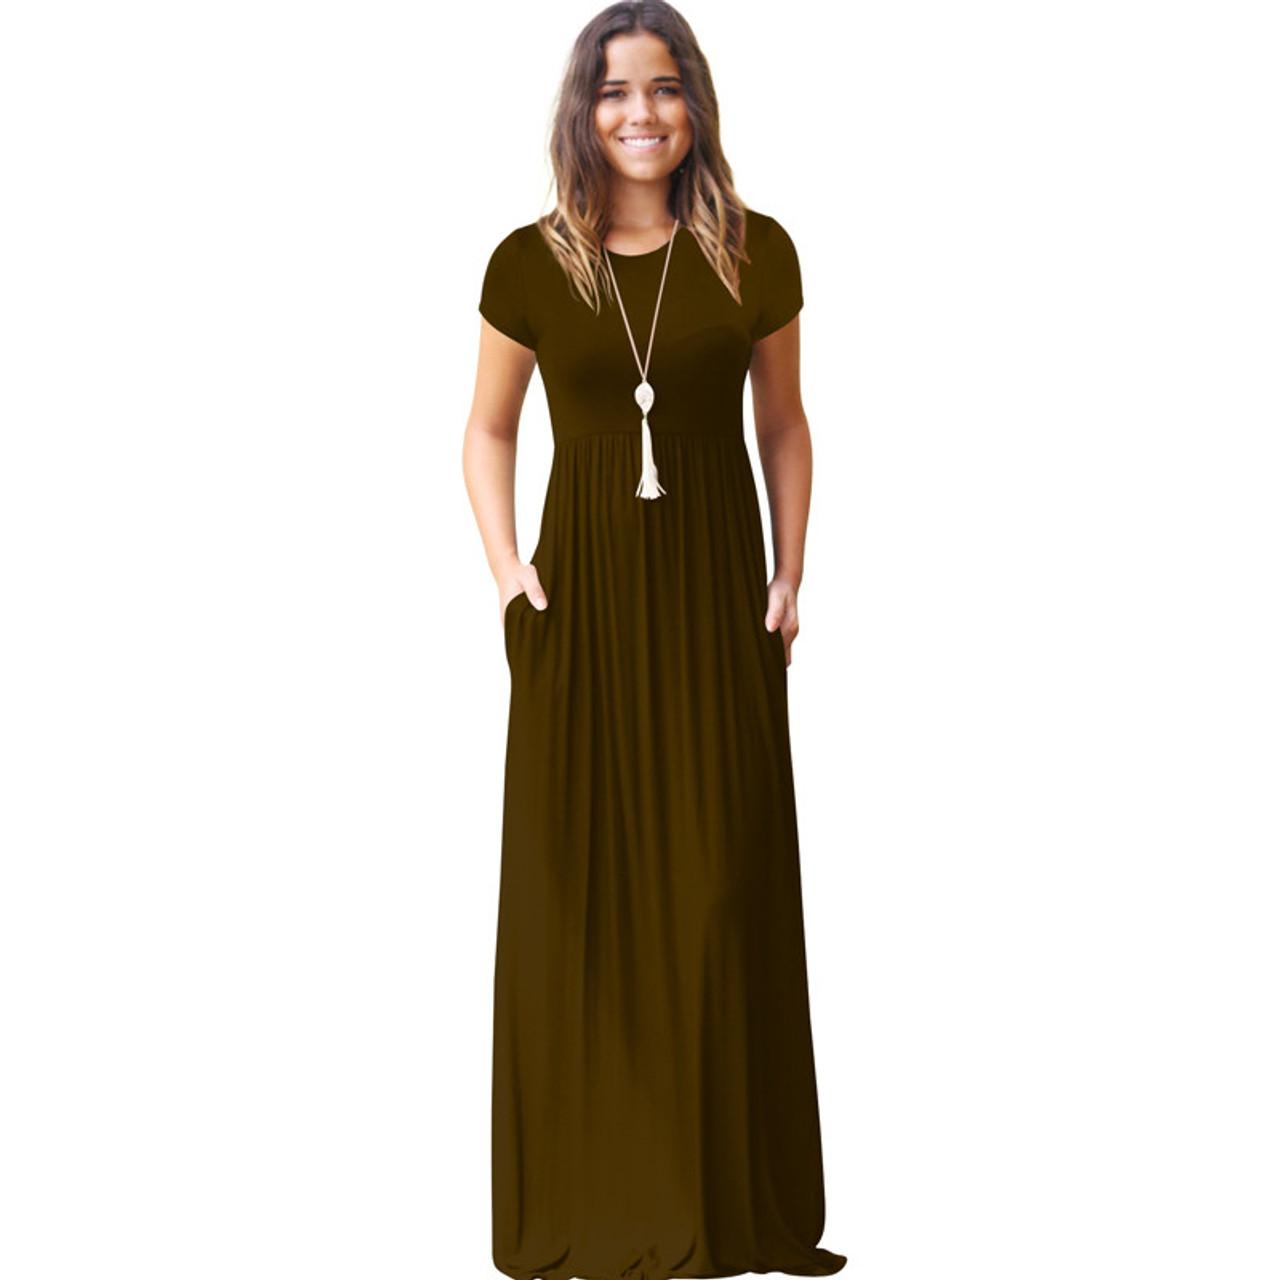 233079b37f ... CINQ DIAMANTS Women Long Dress Summer Maxi Dress Pocket Lange Jurk  Femme Longue Robe Vestido Longo ...